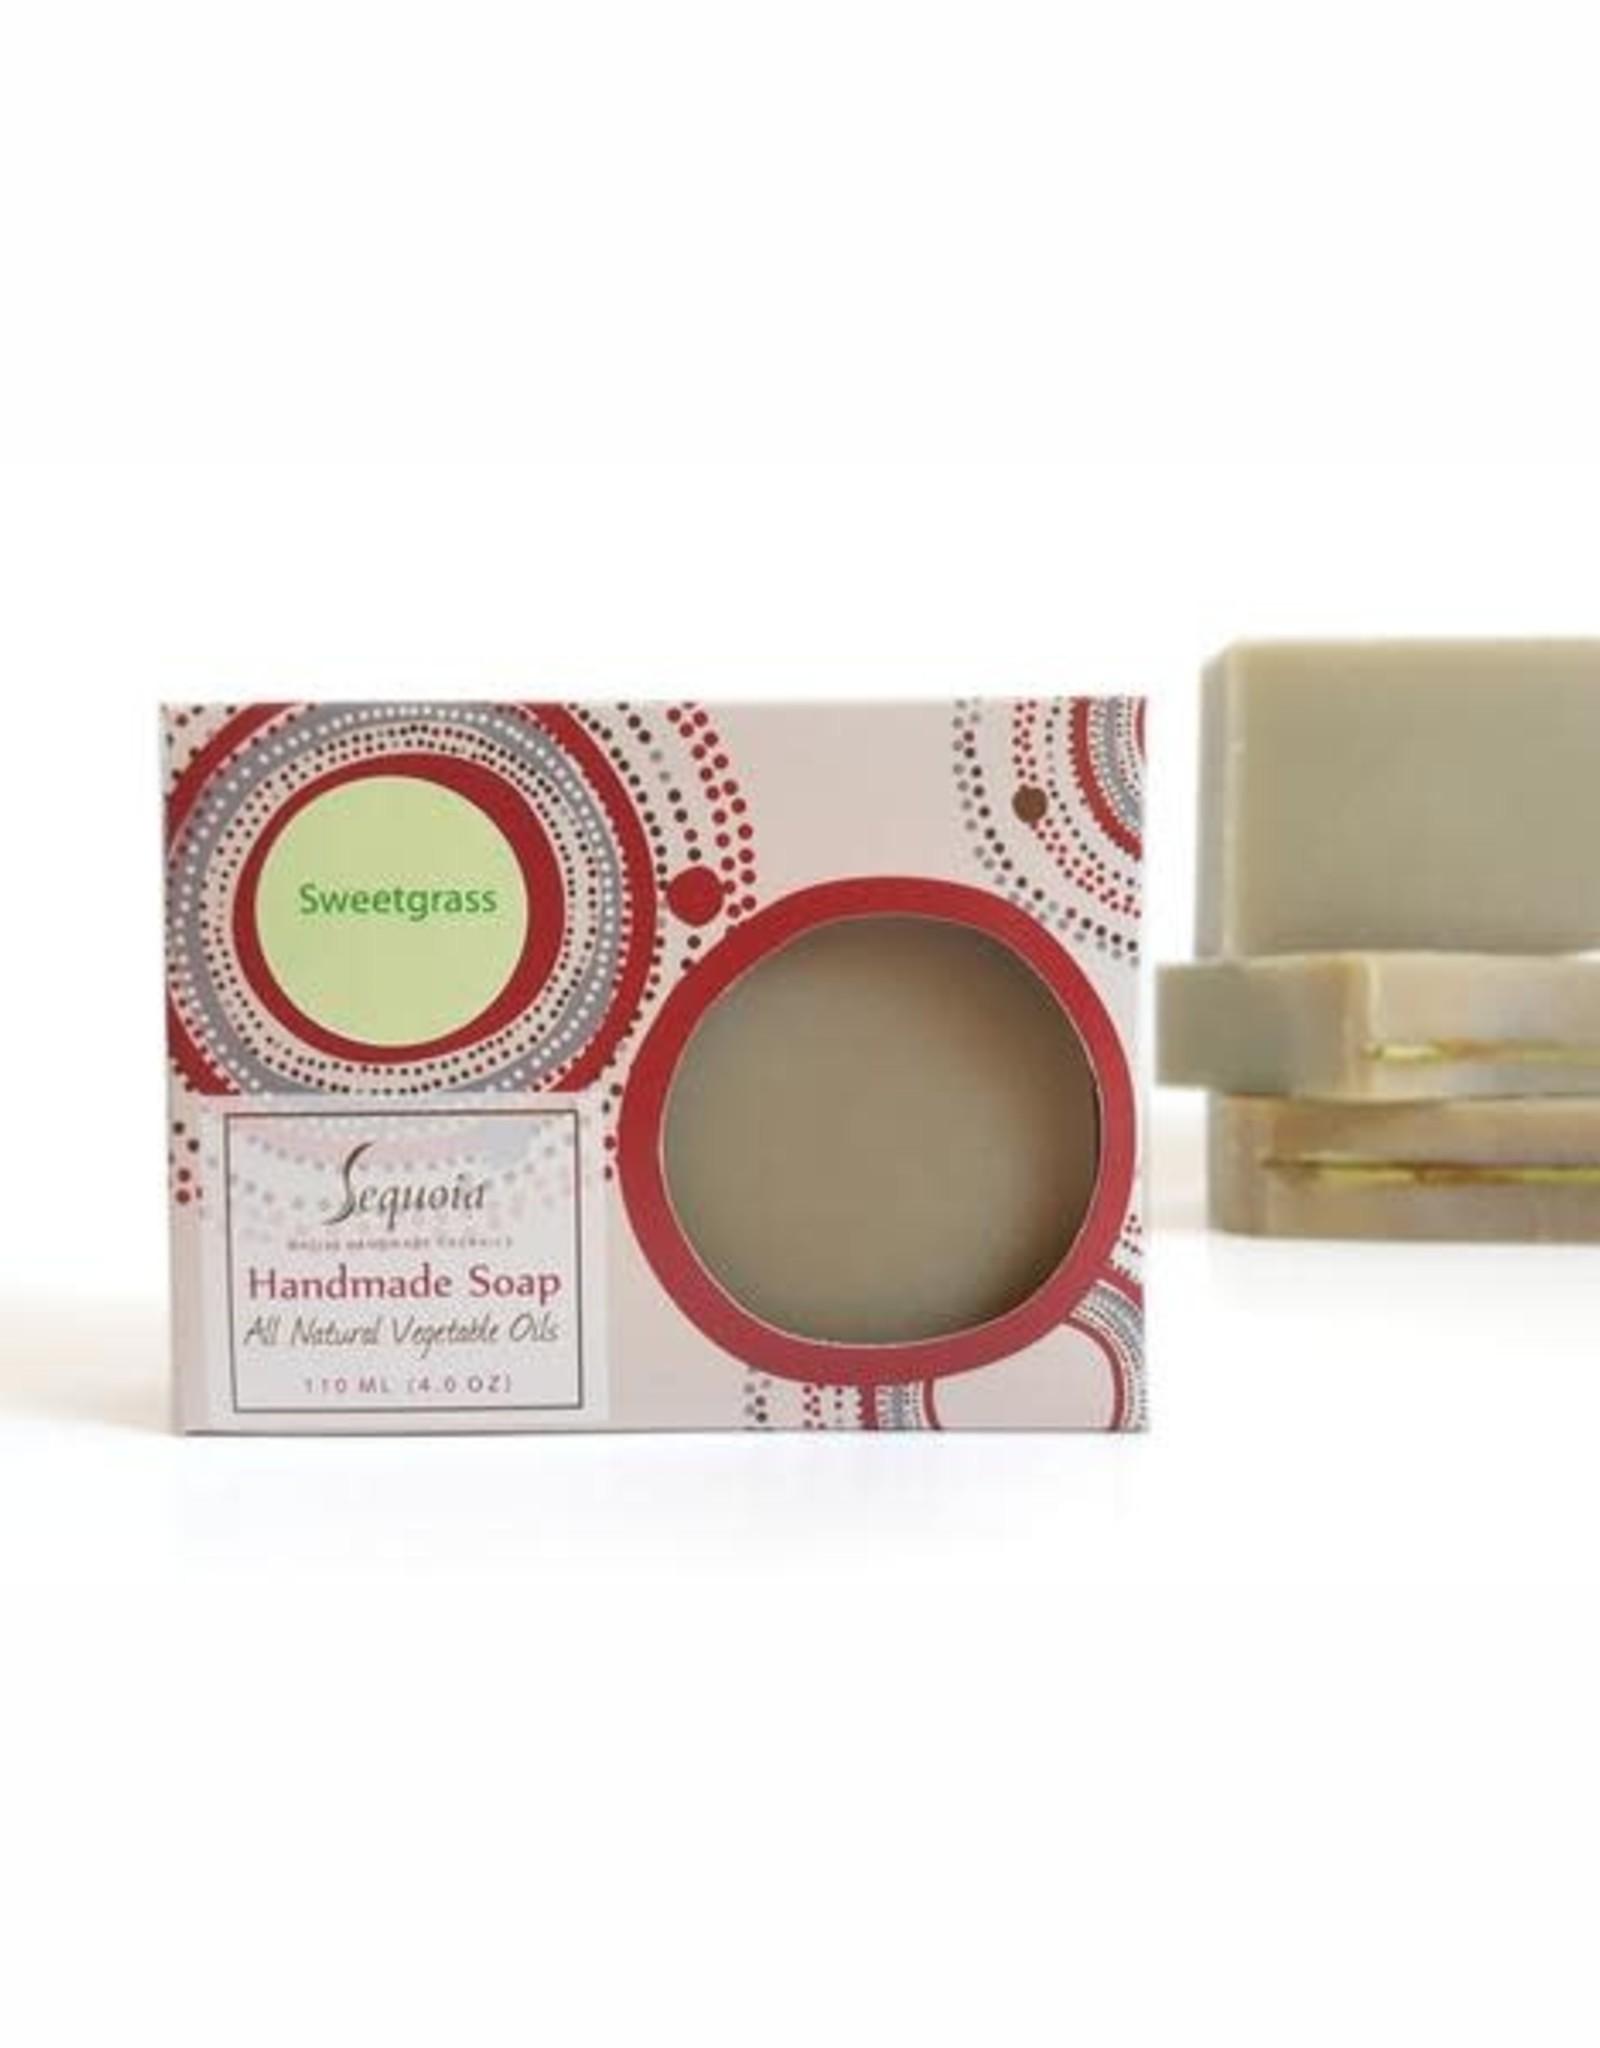 Sequoia Handmade soap 4oz - Sweetgrass